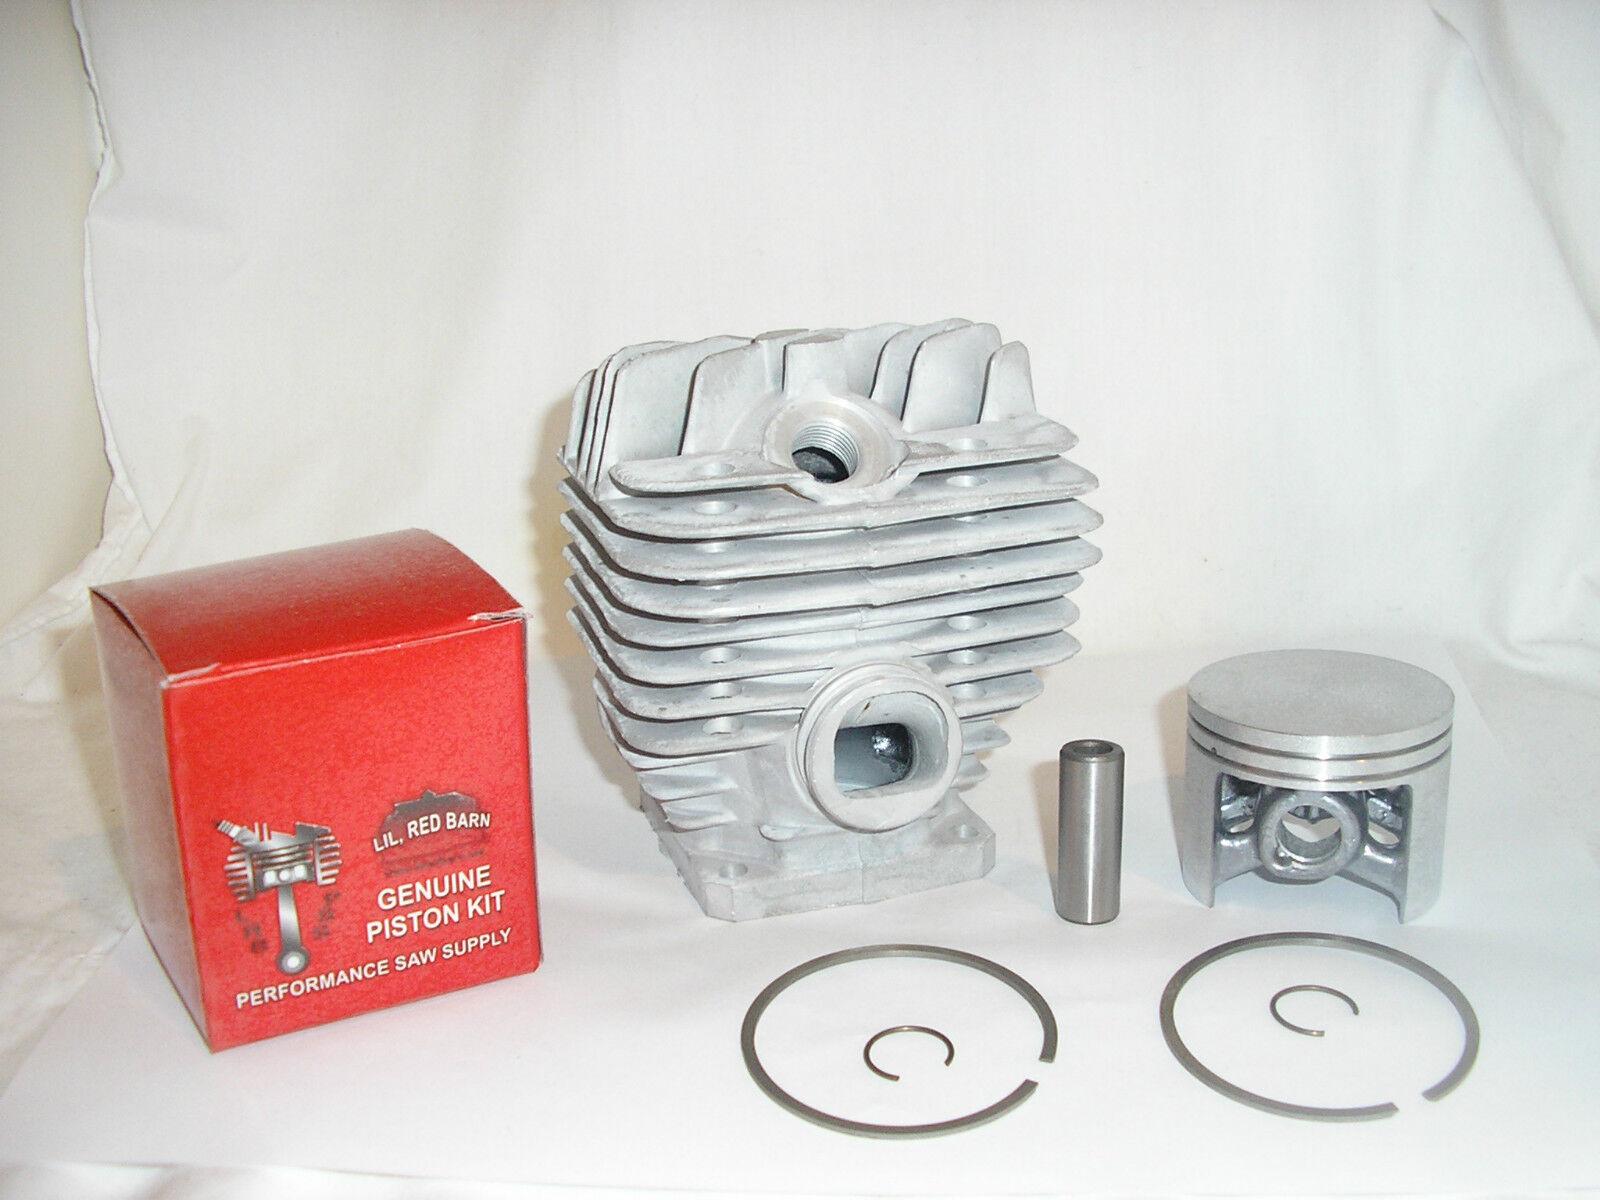 STIHL 044 CYLINDER & Pistón Kit 50MM Kit, 12MM Pasador del pistón reemplaza 1128 020 1227